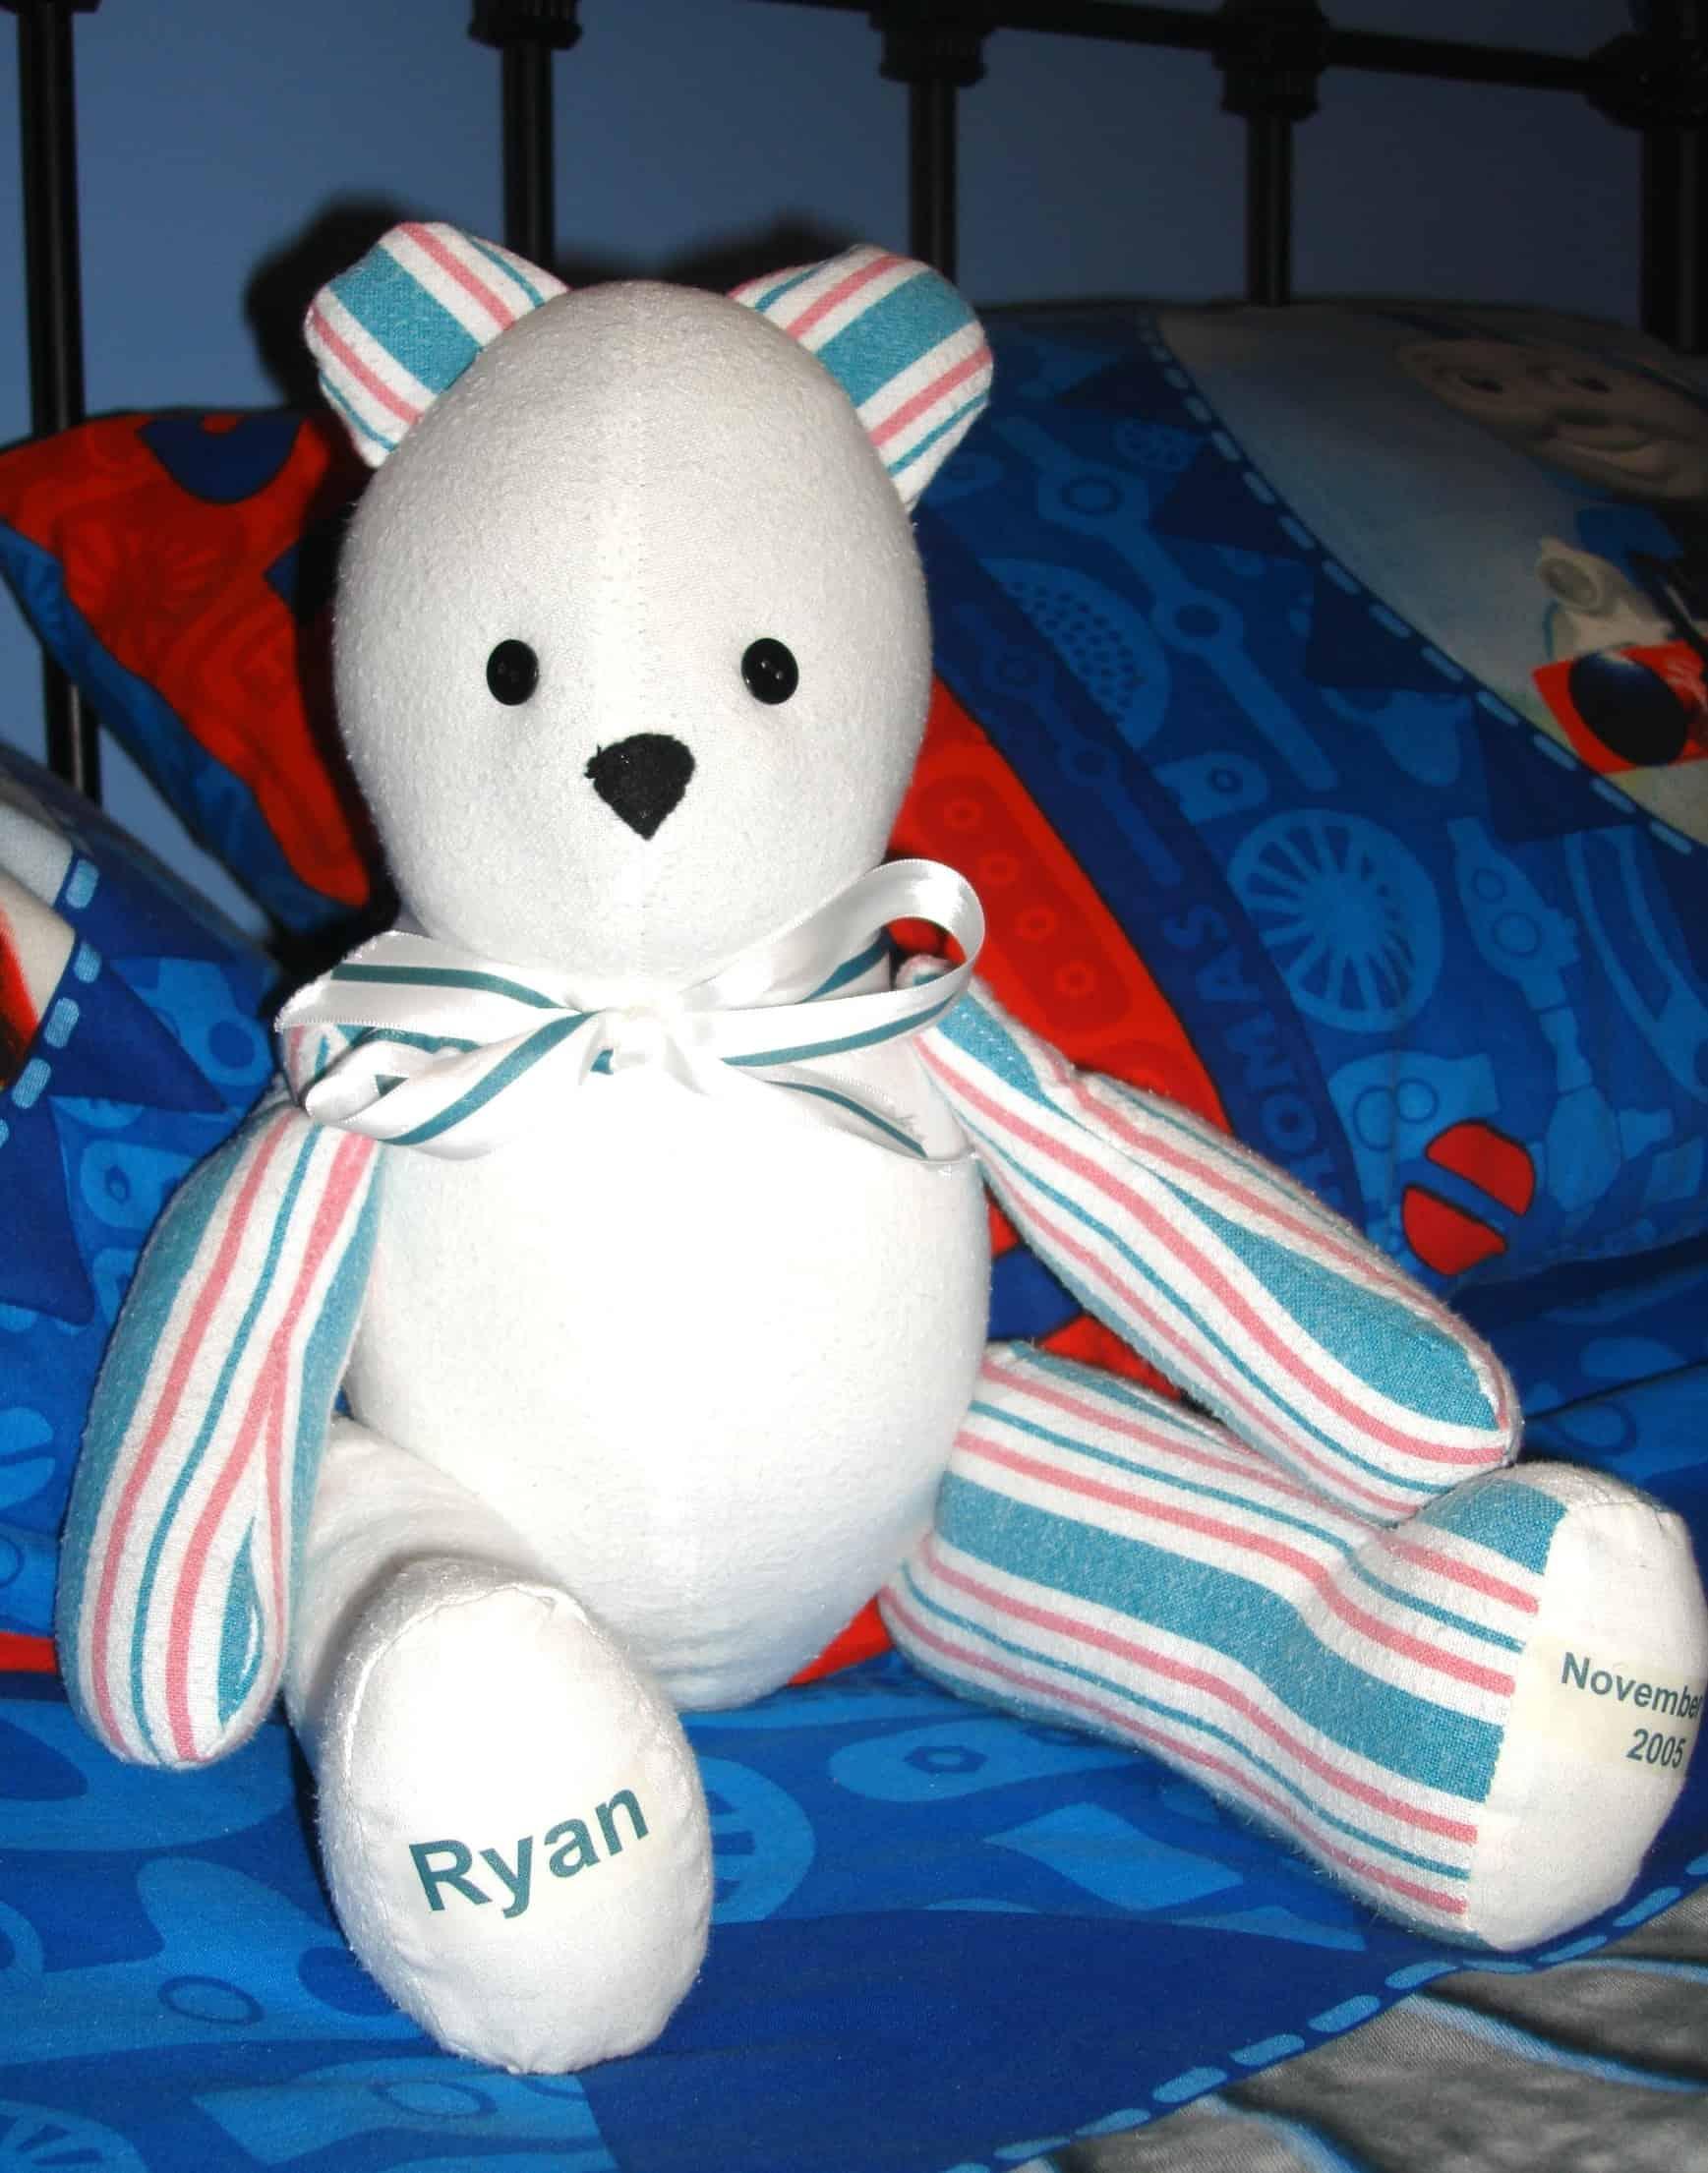 Baby's hospital blanket